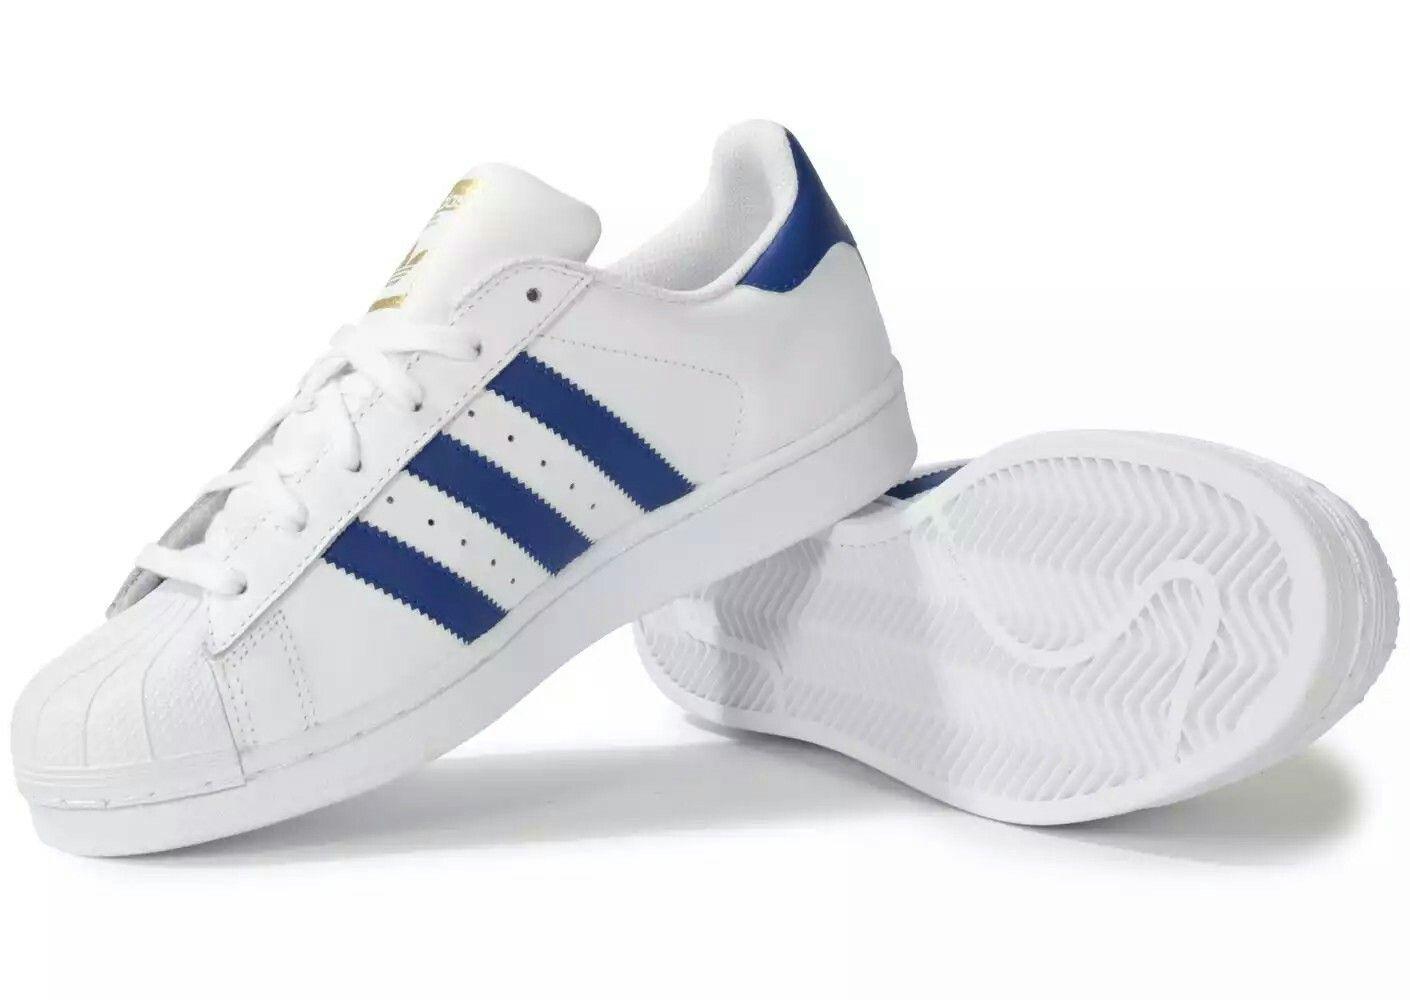 save off f49f4 7cc27 Adidas Superstar Fondation blanc et bleu